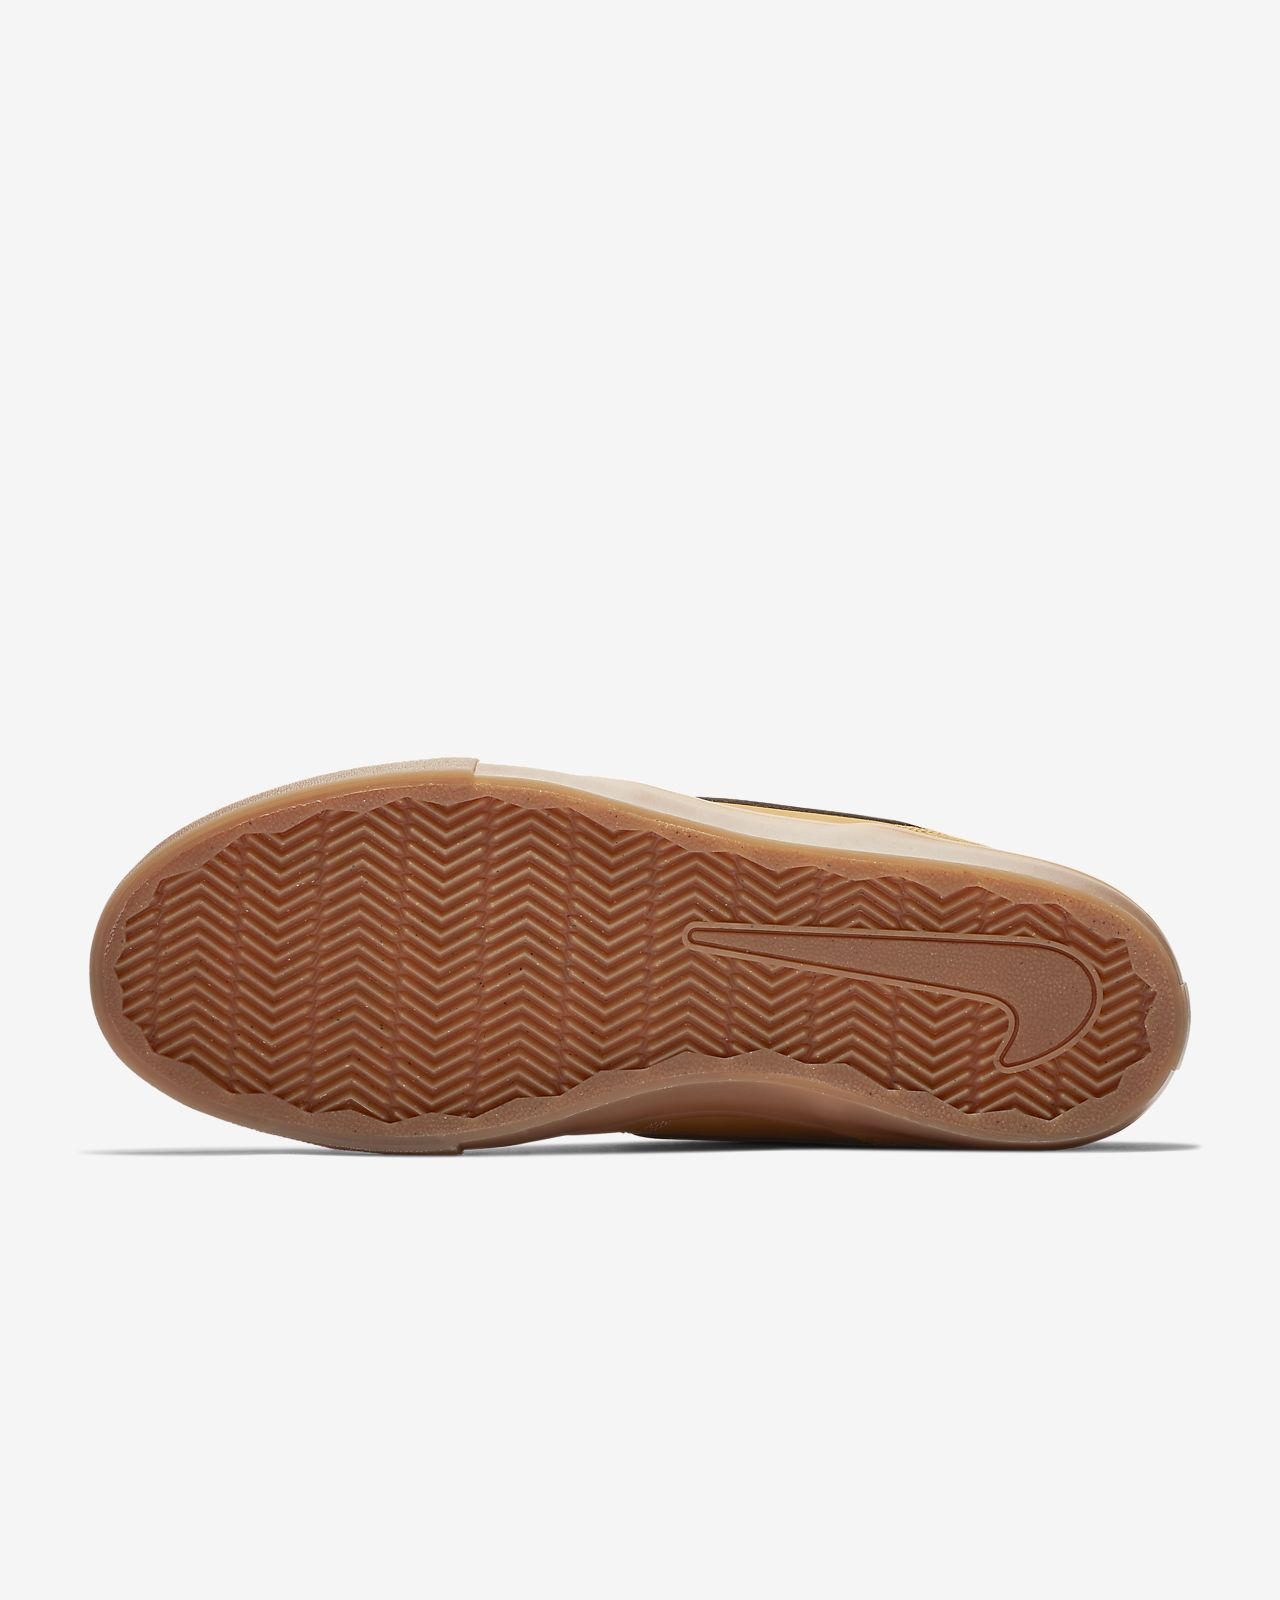 05d15f946b Nike SB Portmore II Solarsoft Mid Bota Skateboarding Shoe. Nike.com AU